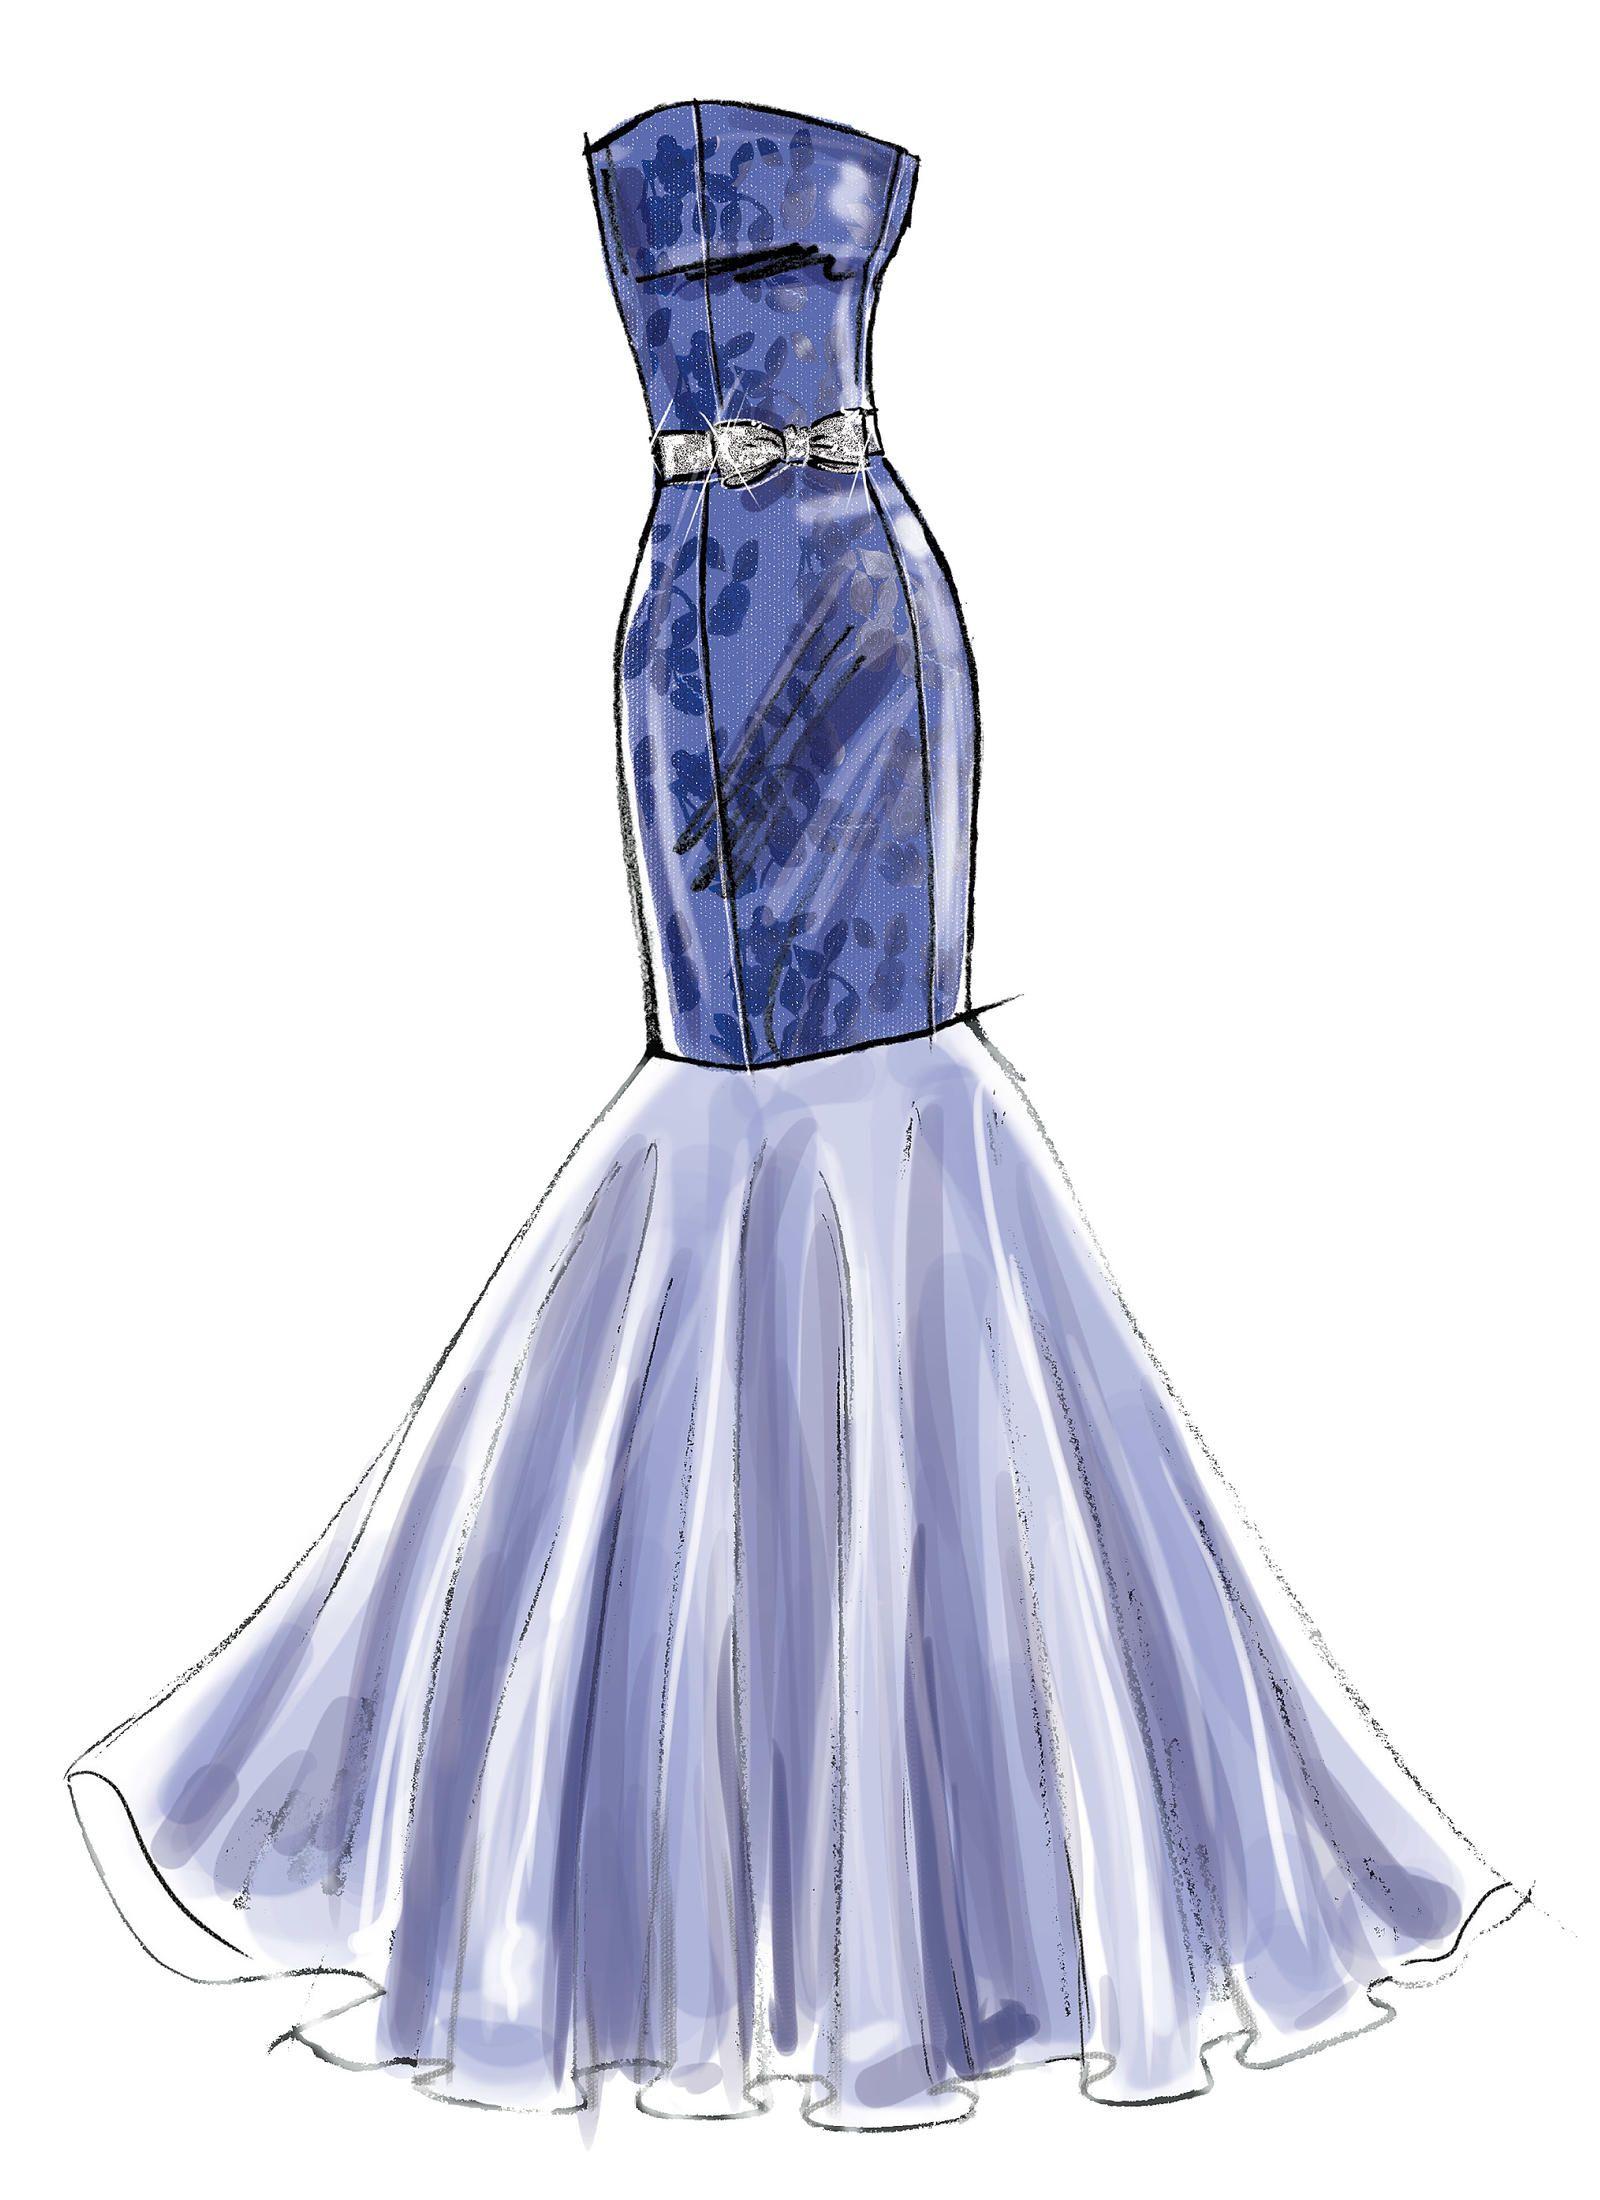 M6838 | McCall\'s Patterns | Illustracion fashion | Pinterest ...